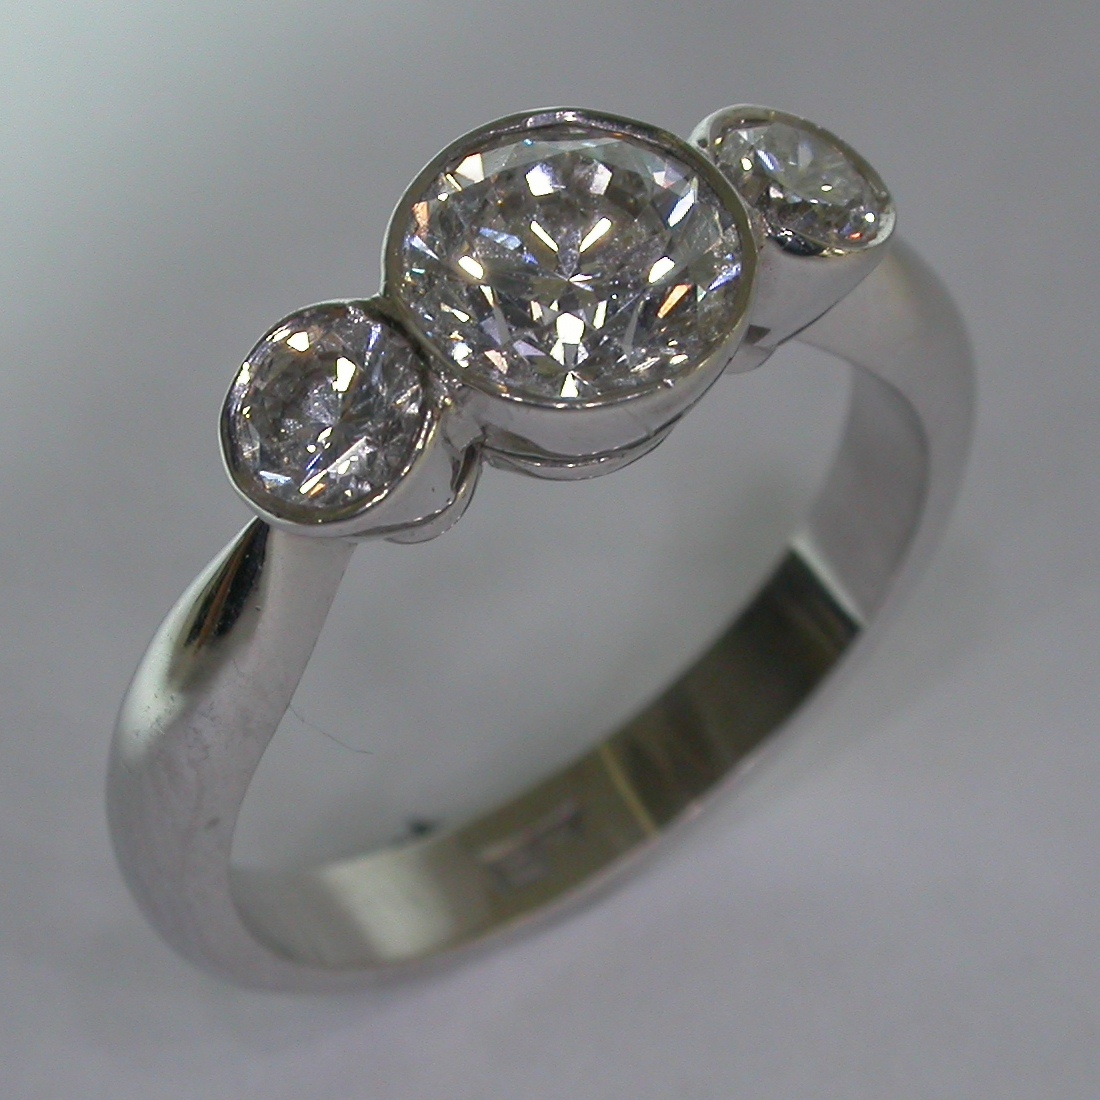 Diamond Engagement Ring - #6629